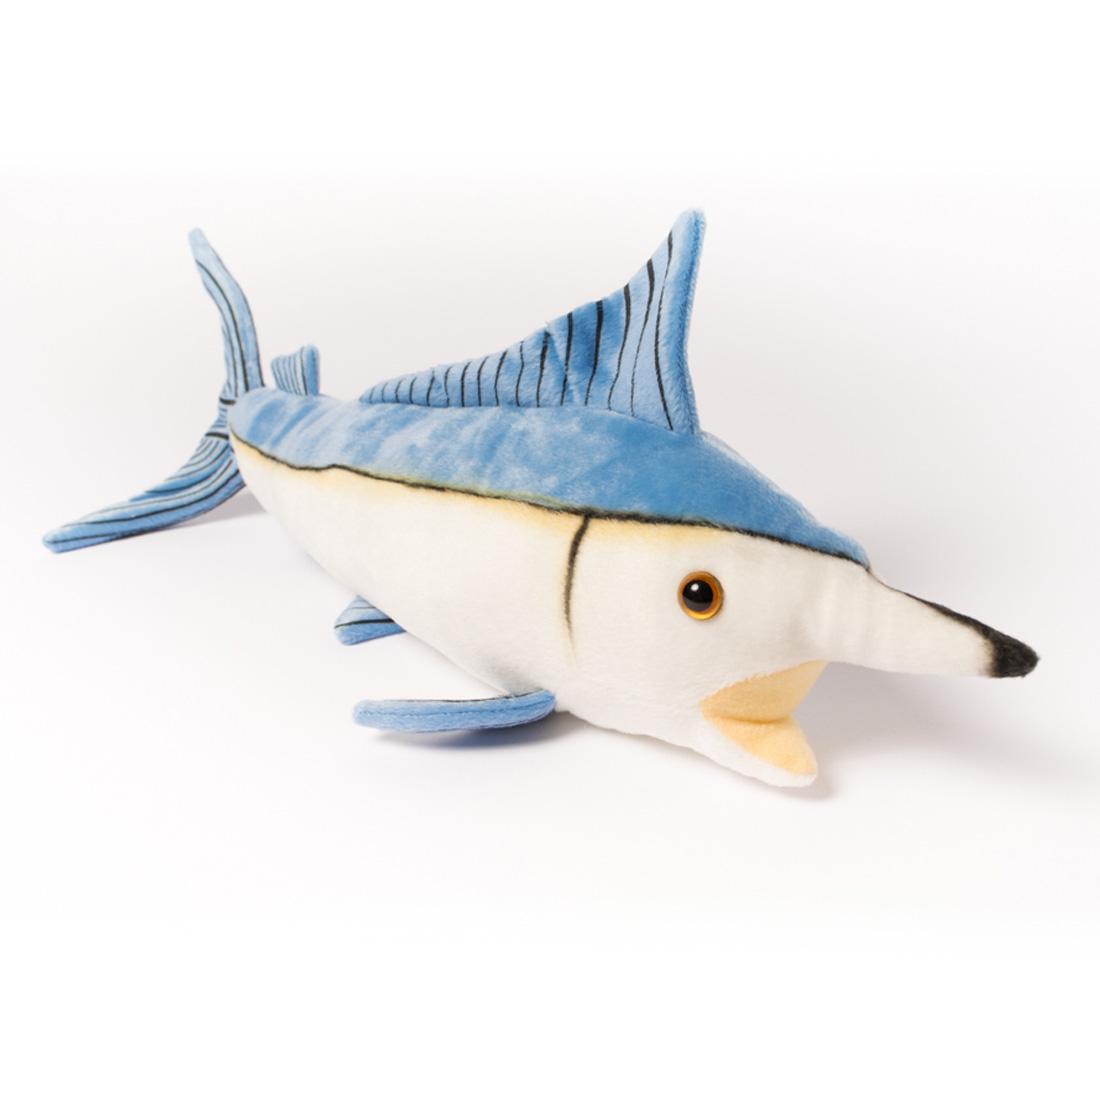 Cabin Critters – Blue Marlin | ブルーマーリン(クロカジキ)